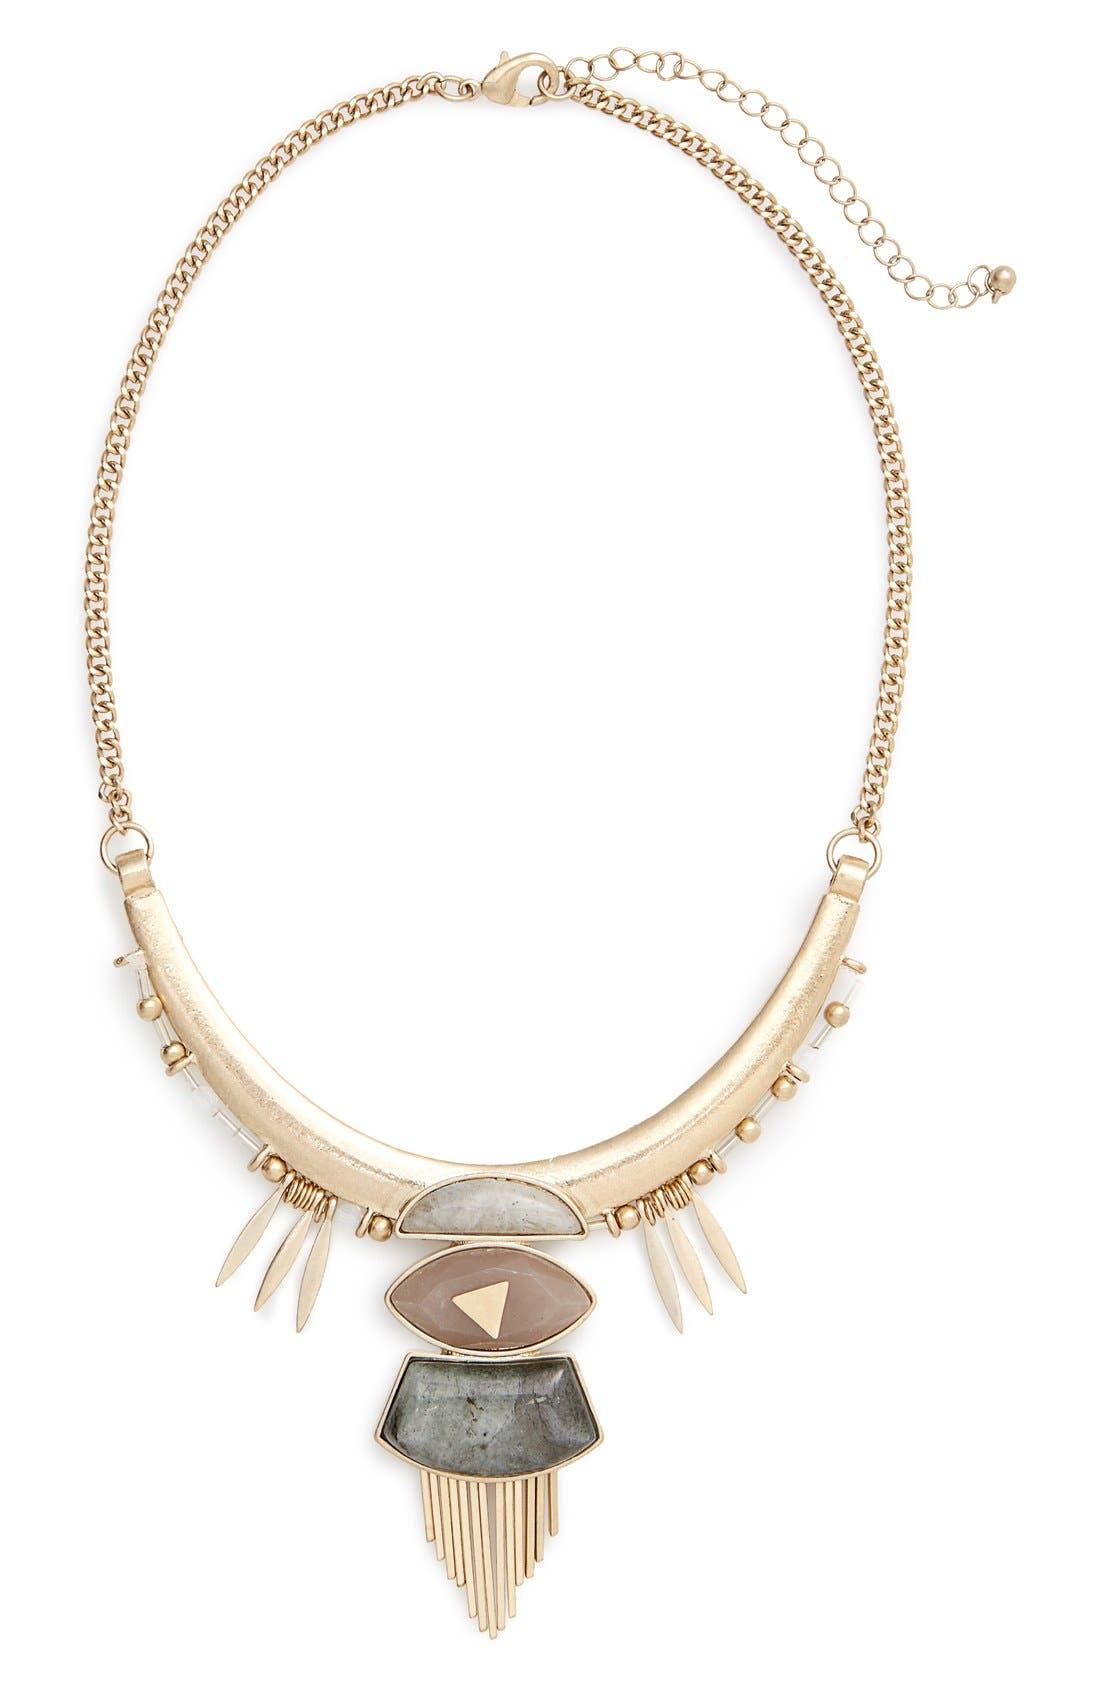 Main Image - Danielle Nicole 'Great Warrior' Collar Necklace